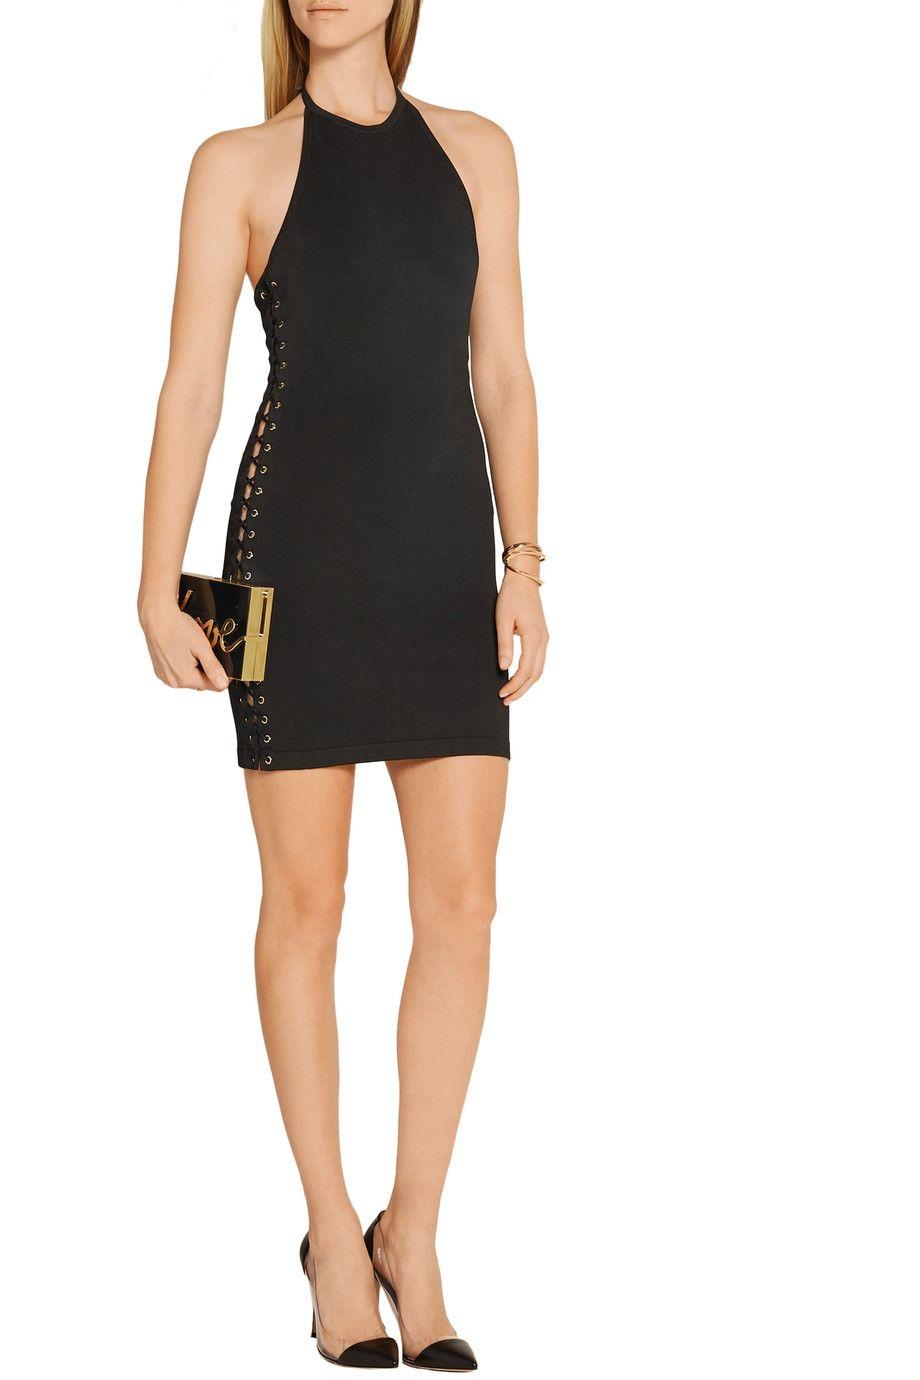 Shop on-sale Balmain Lace-up stretch-knit mini dress. Browse other